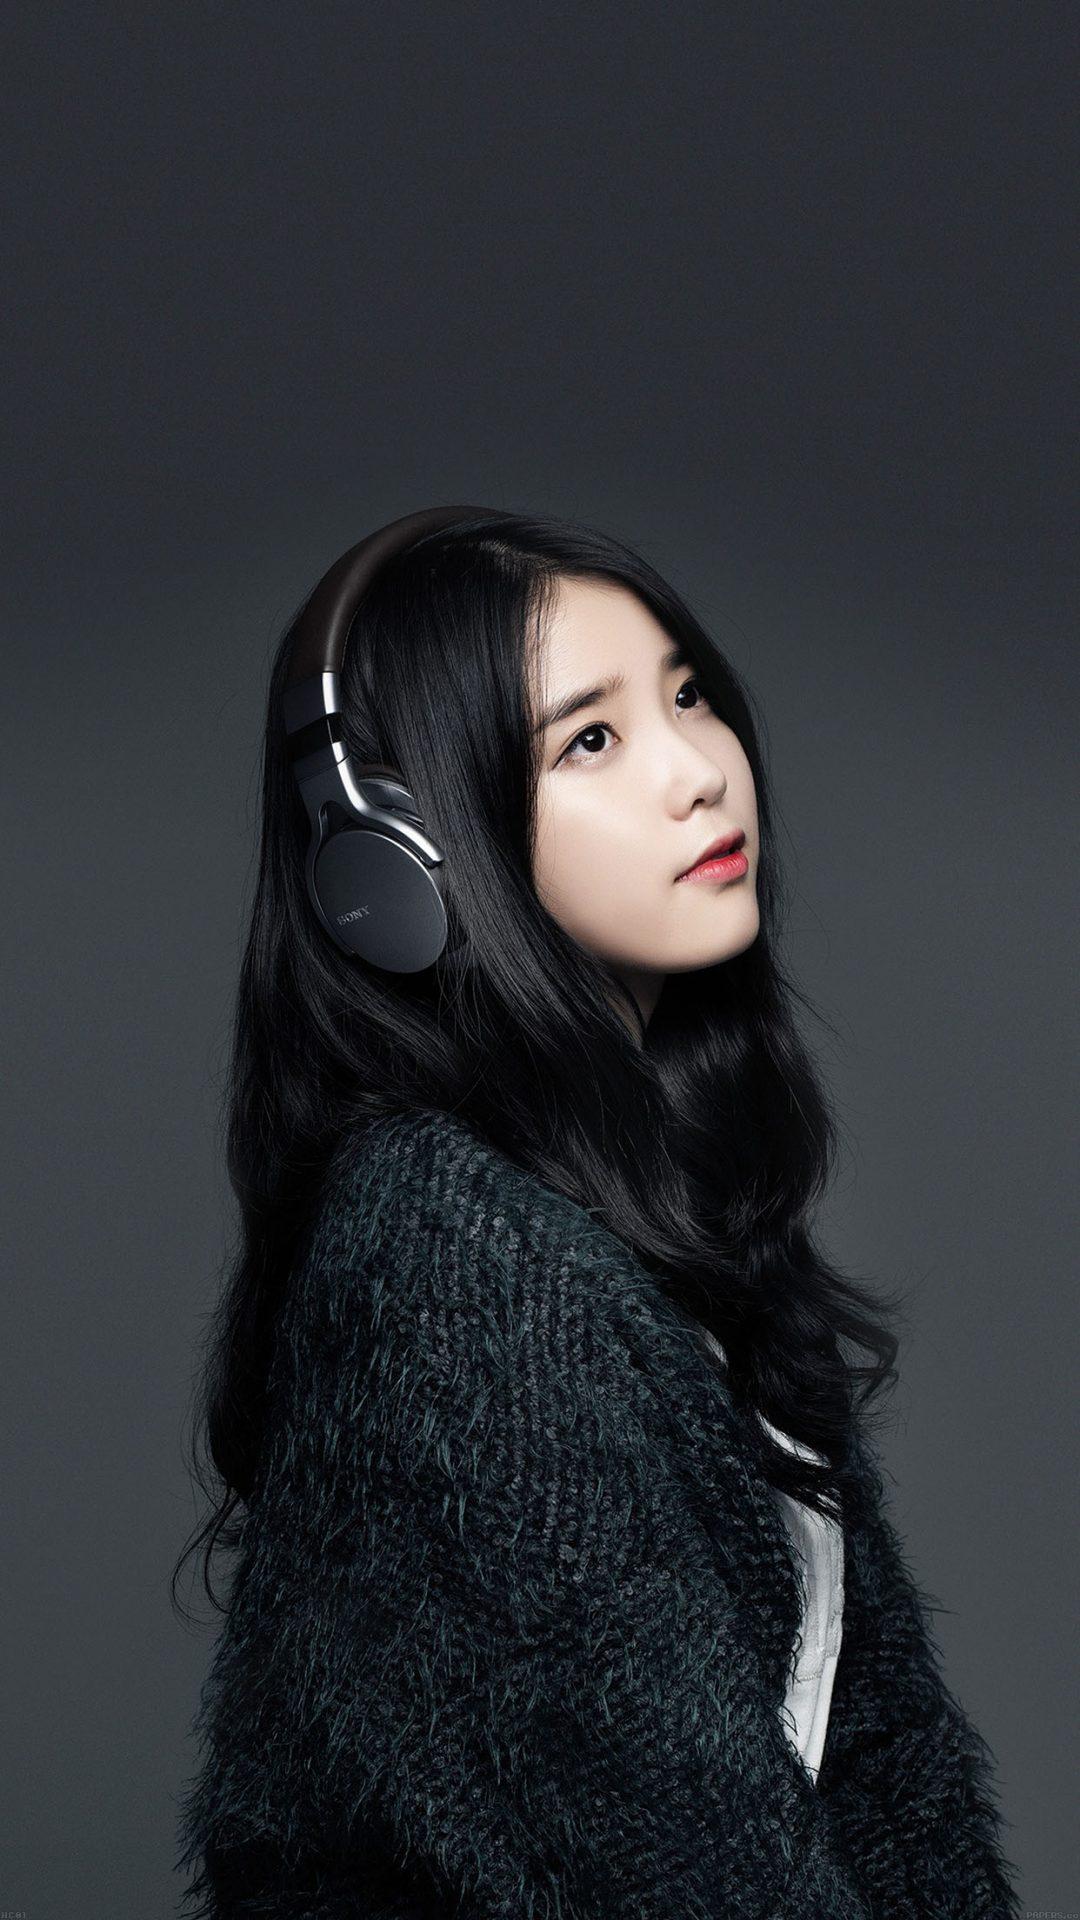 Iu Kpop Star Music Sony